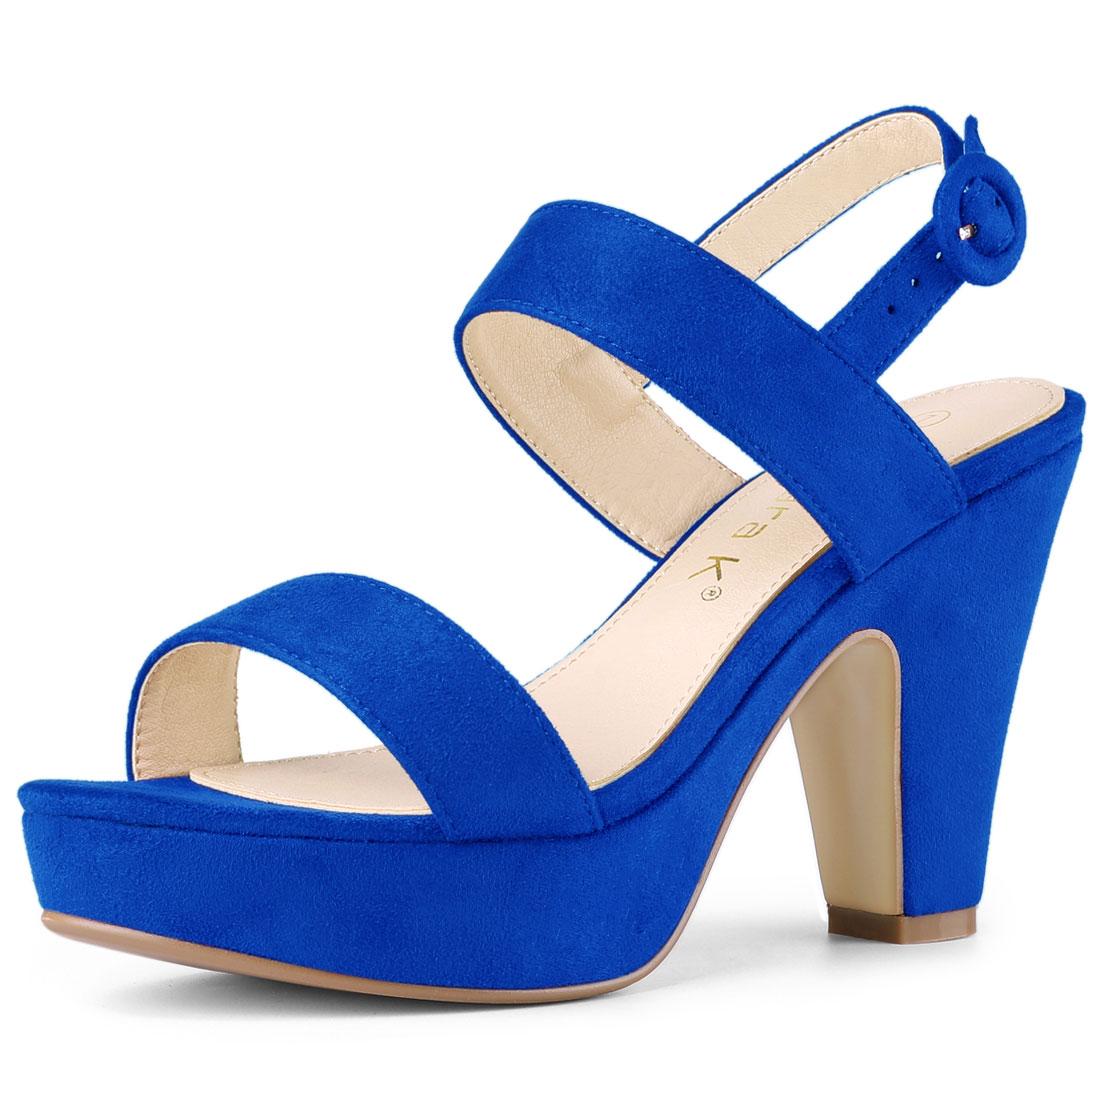 Allegra K Women's Slingback Platform Chunky Heel Sandals Deep Blue US 7